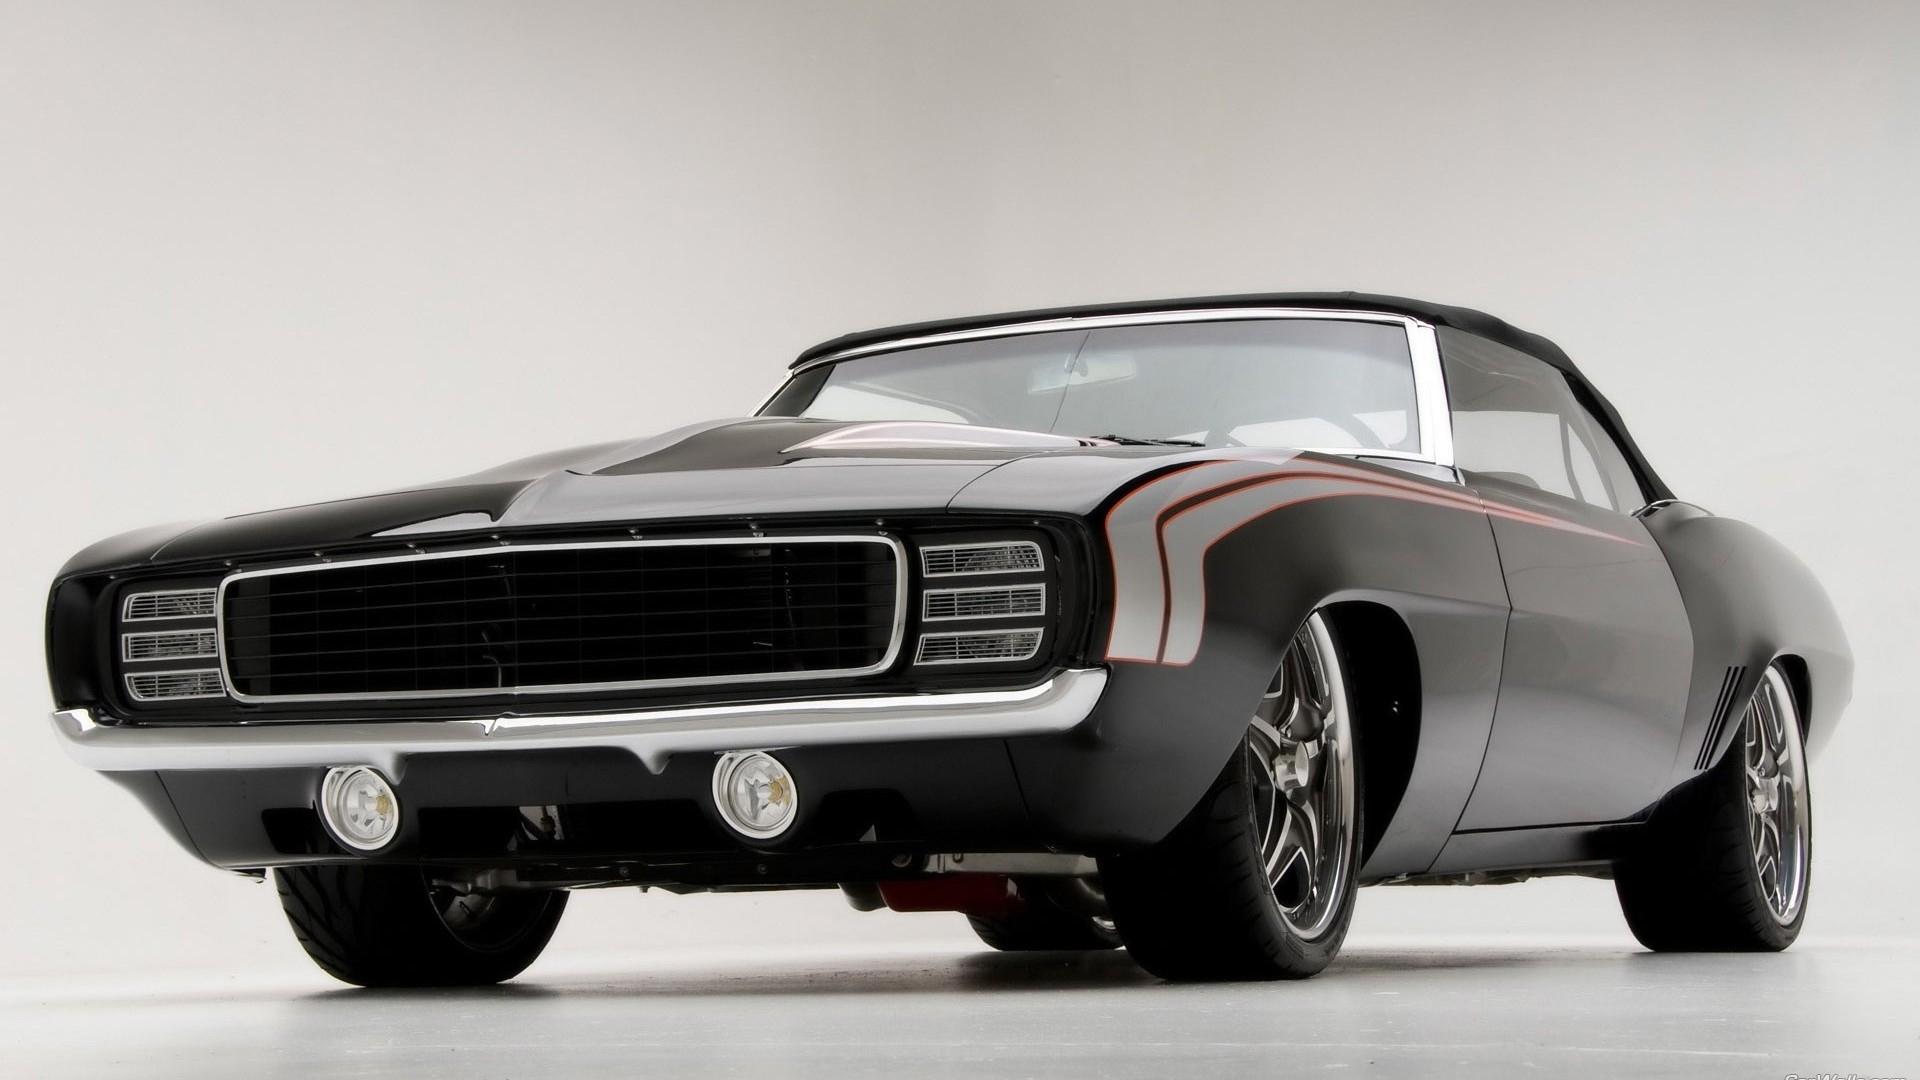 23298) chevy muscle car wallpaper design - walops